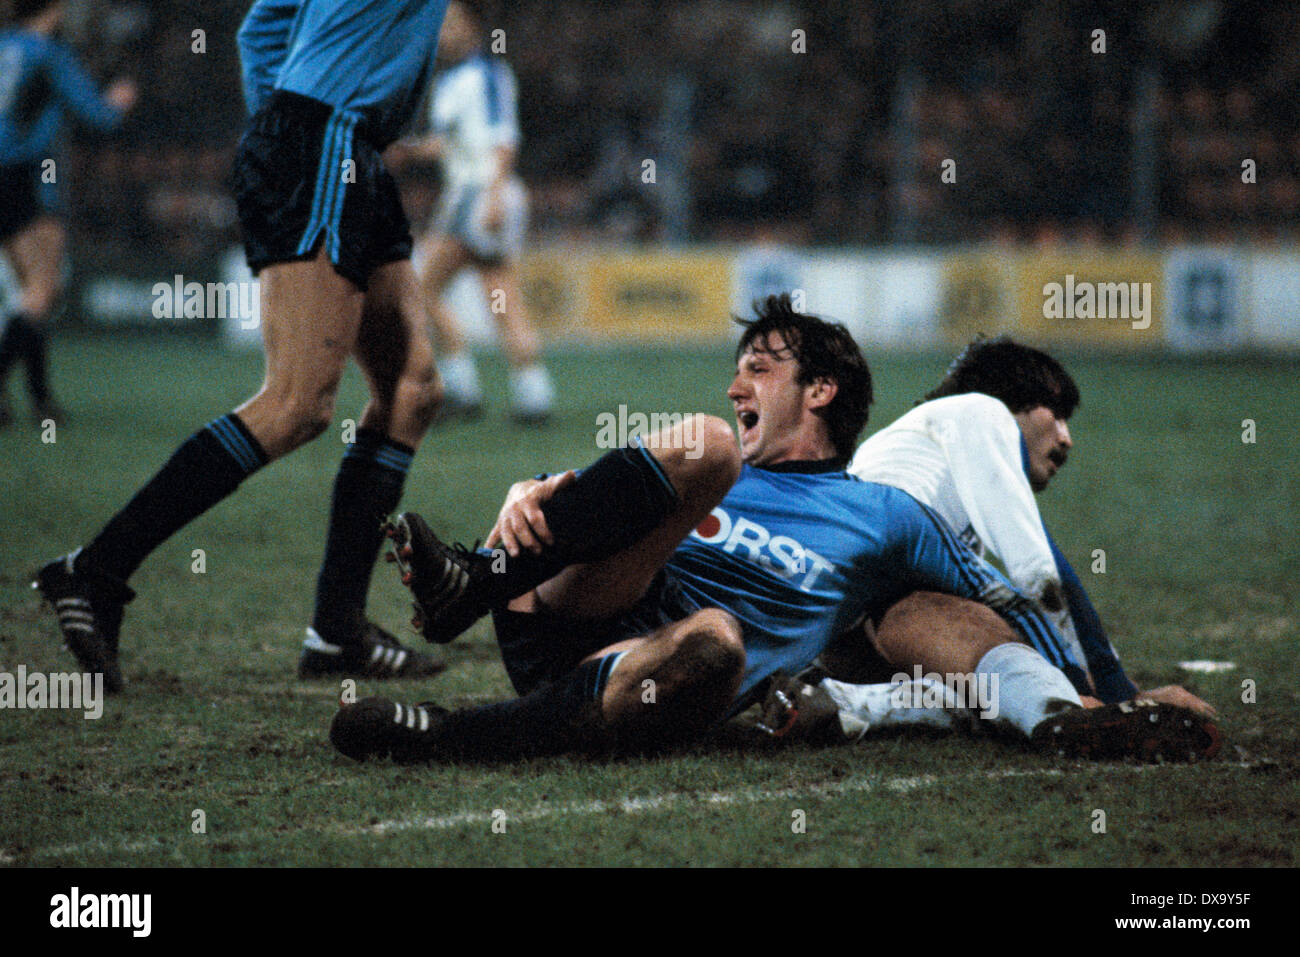 Fußball, Bundesliga, 1980/1981, Ruhrstadion, VfL Bochum gegen TSV 1860 München 4:1, Szene des Spiels, Stockbild